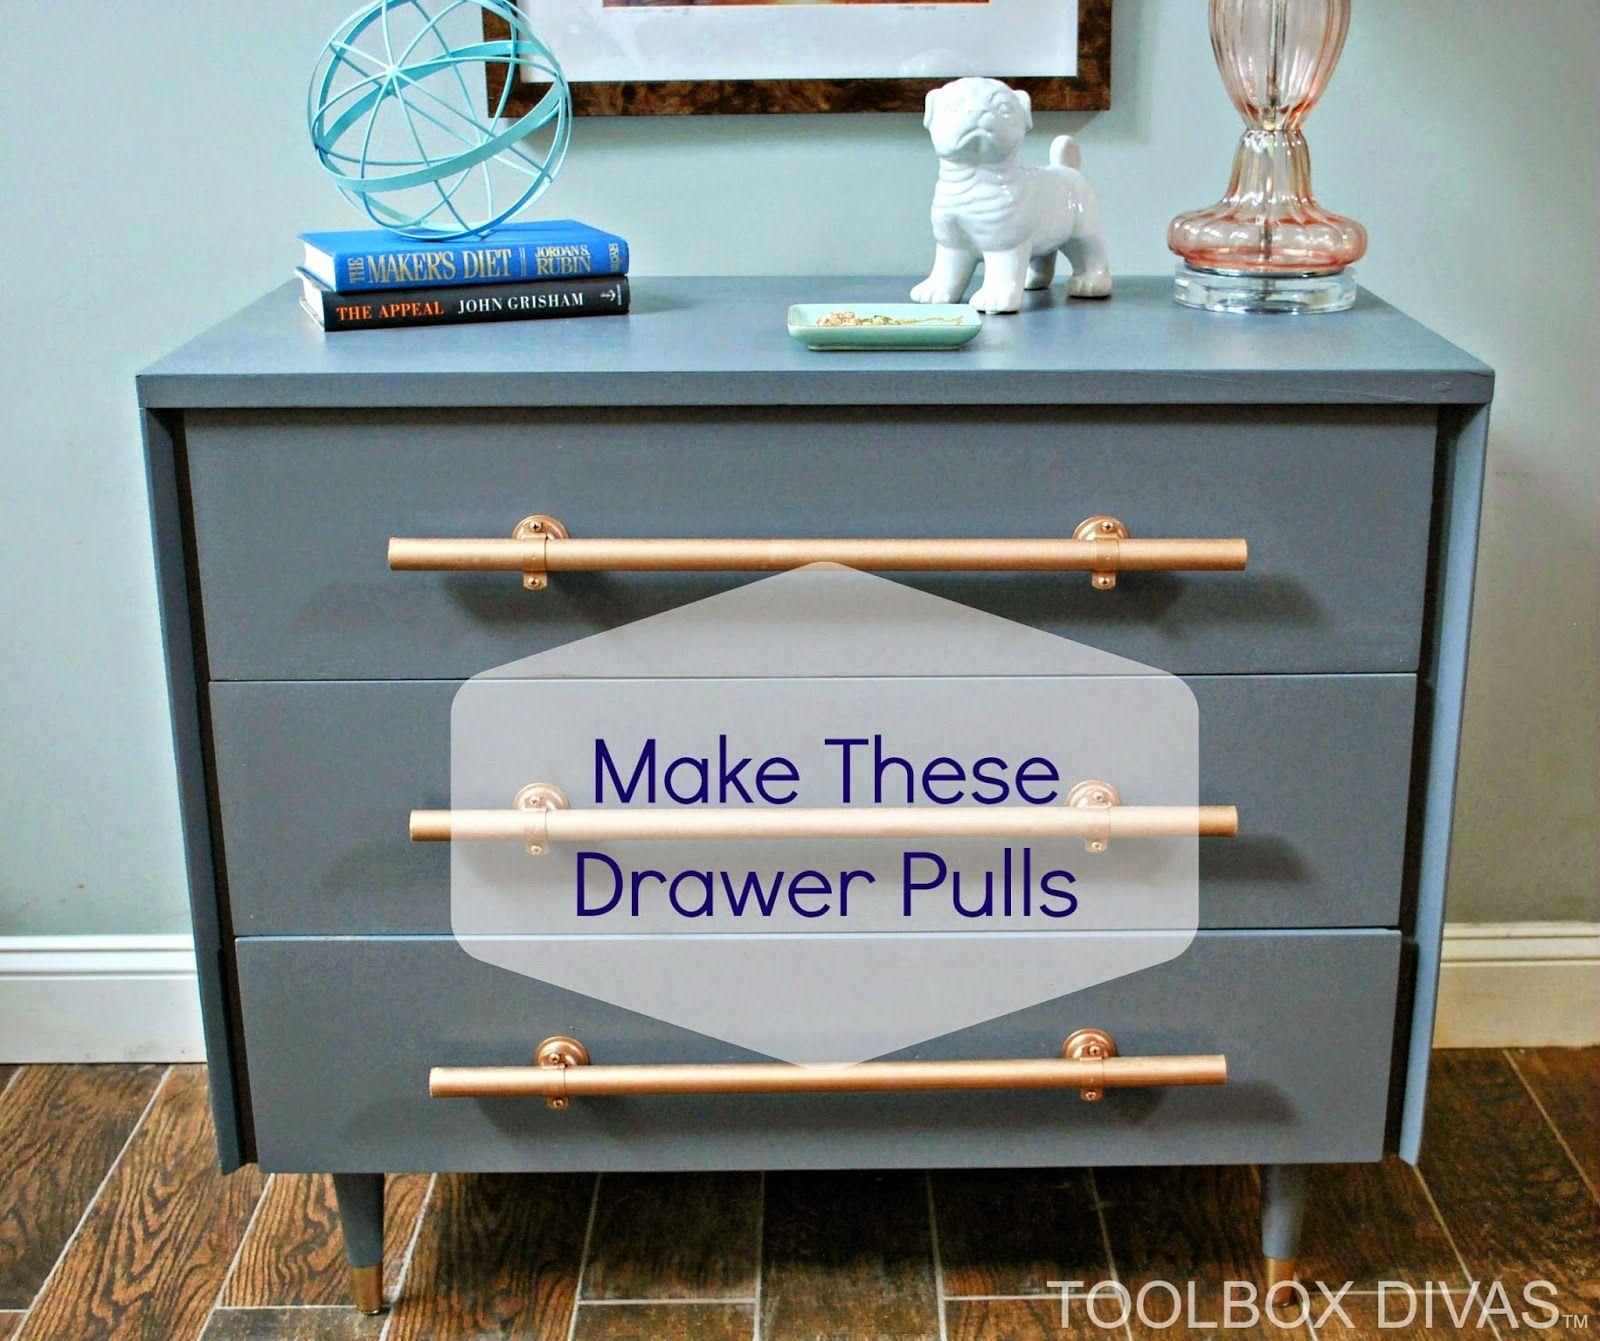 Diy How To Make Drawer Pulls How To Make Drawers Drawer Pulls